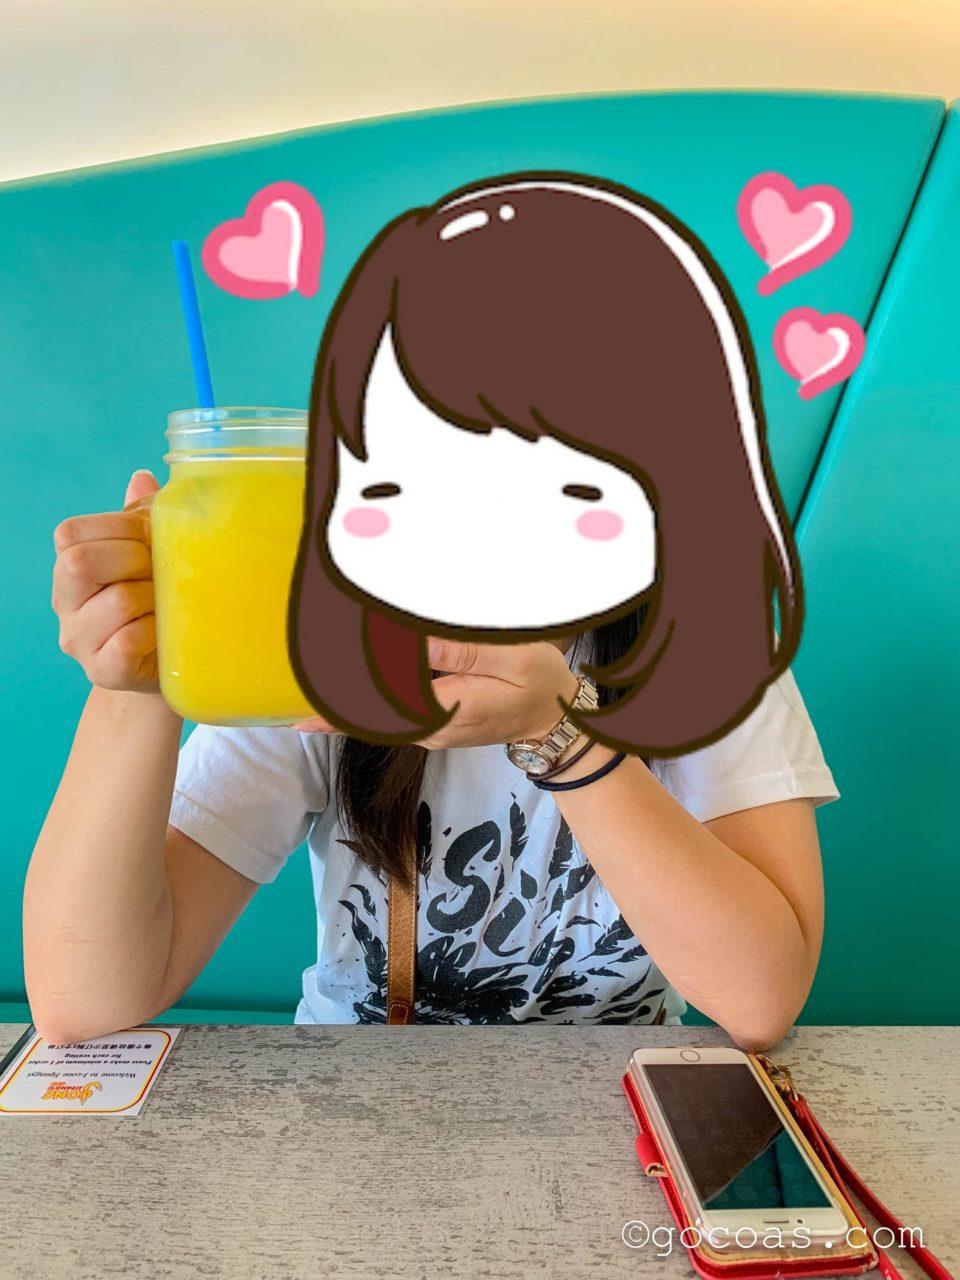 JCone Jipangyiのジュースに喜ぶあいり